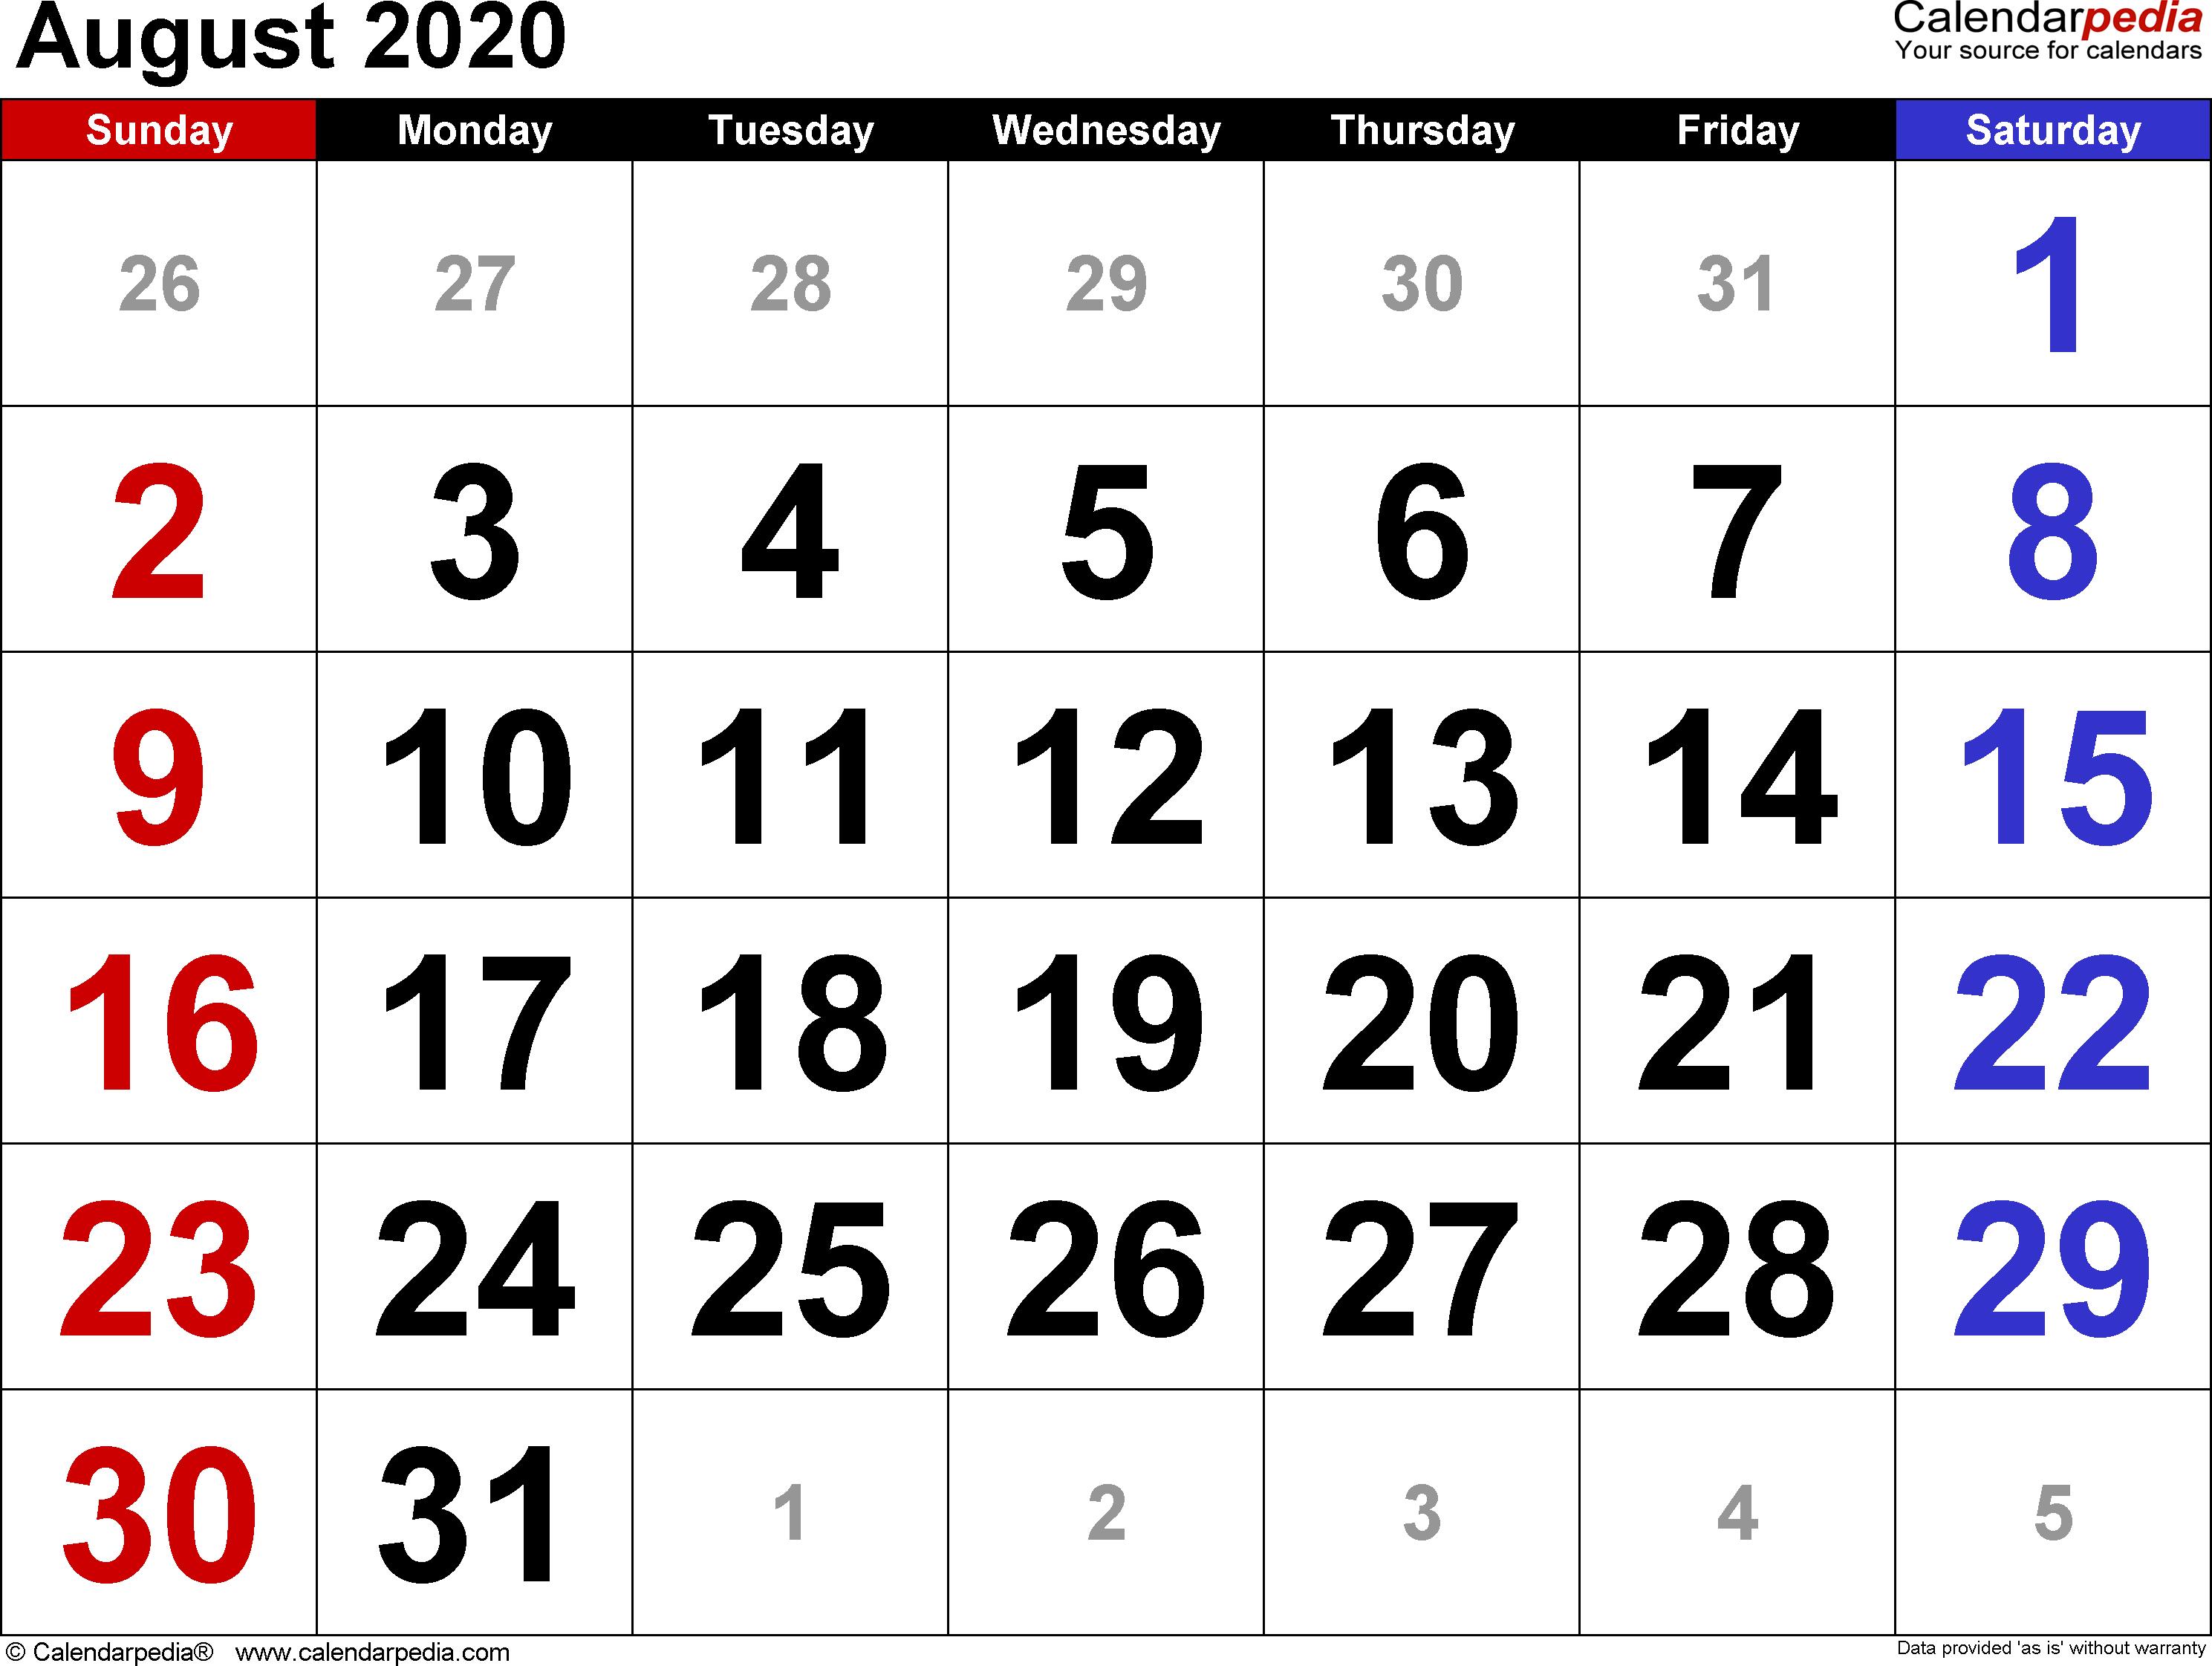 Calendar For Aug 2020  Bolan.horizonconsulting.co inside August 2020 Calendar Printable